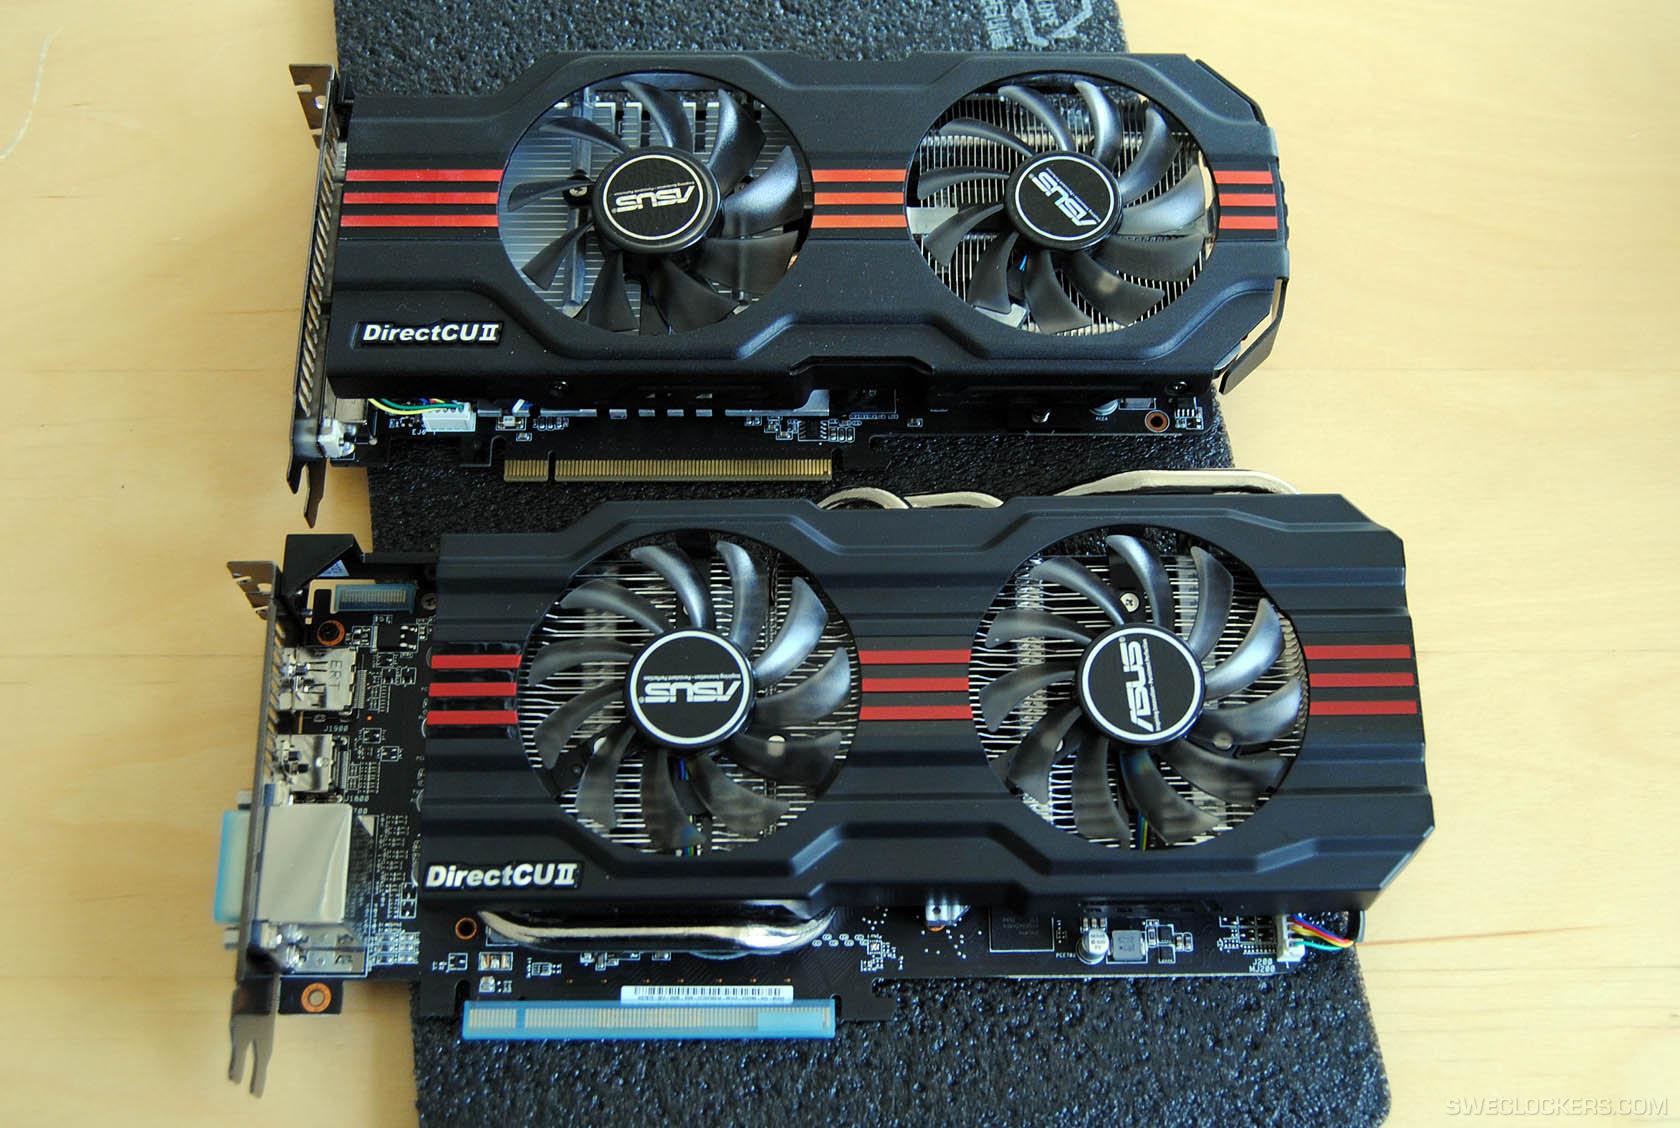 Asus equipa la 2ª Rev Direct CU II a la Radeon HD 7870